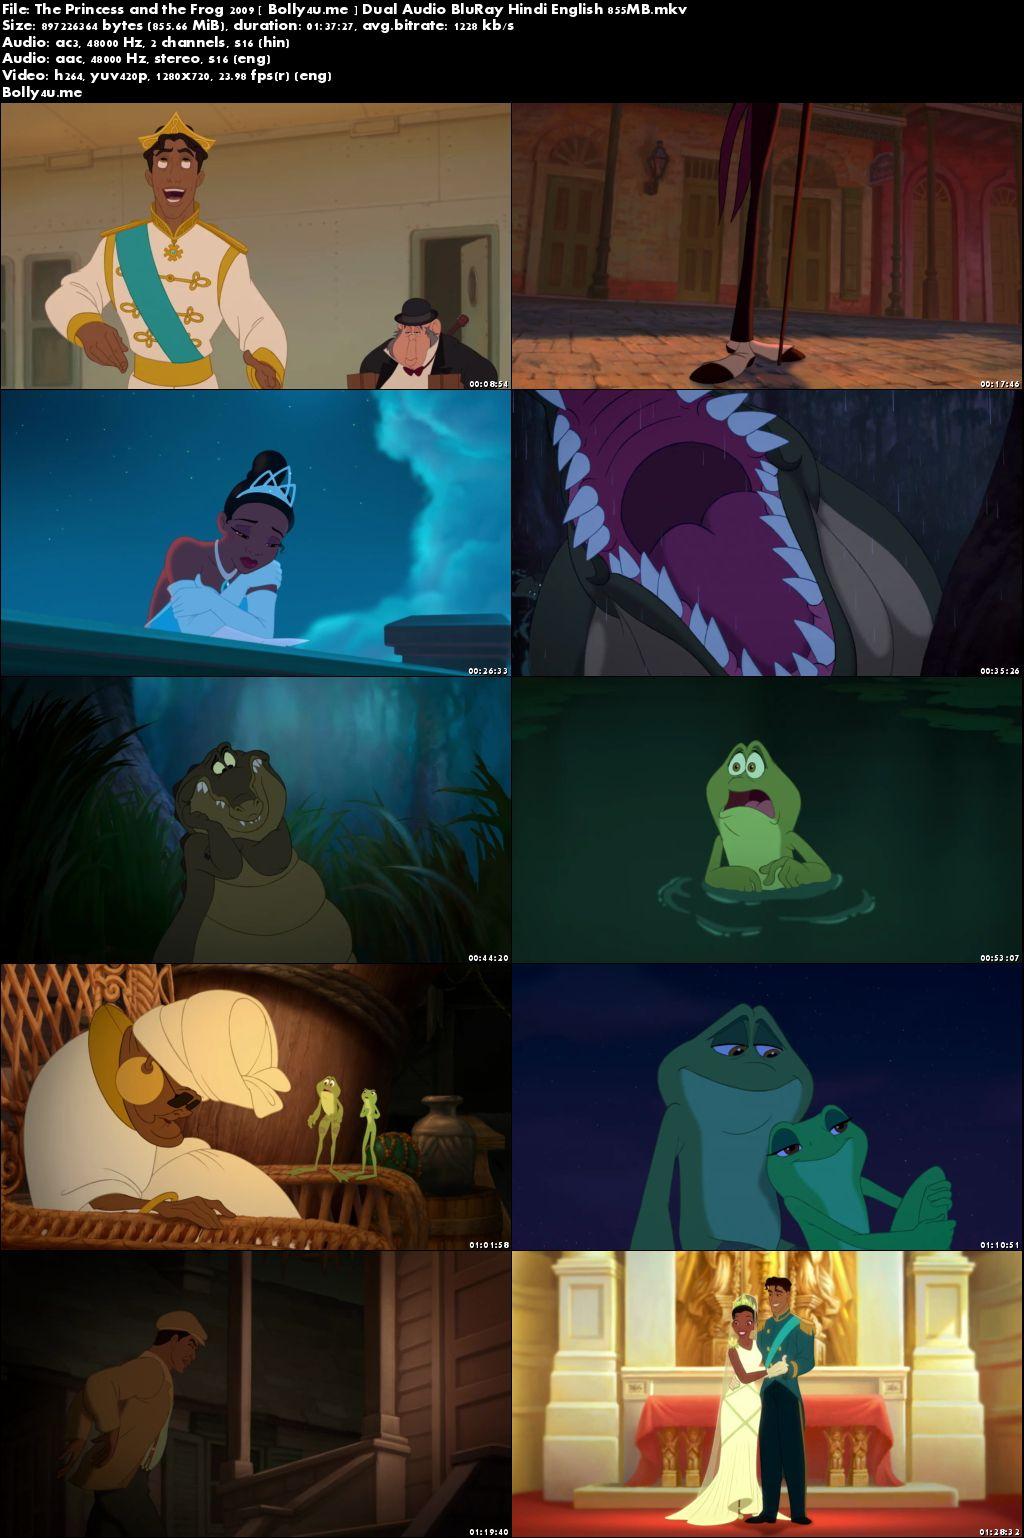 The Princess and the Frog 2009 BRRip 850MB Hindi Dual Audio 720p Download